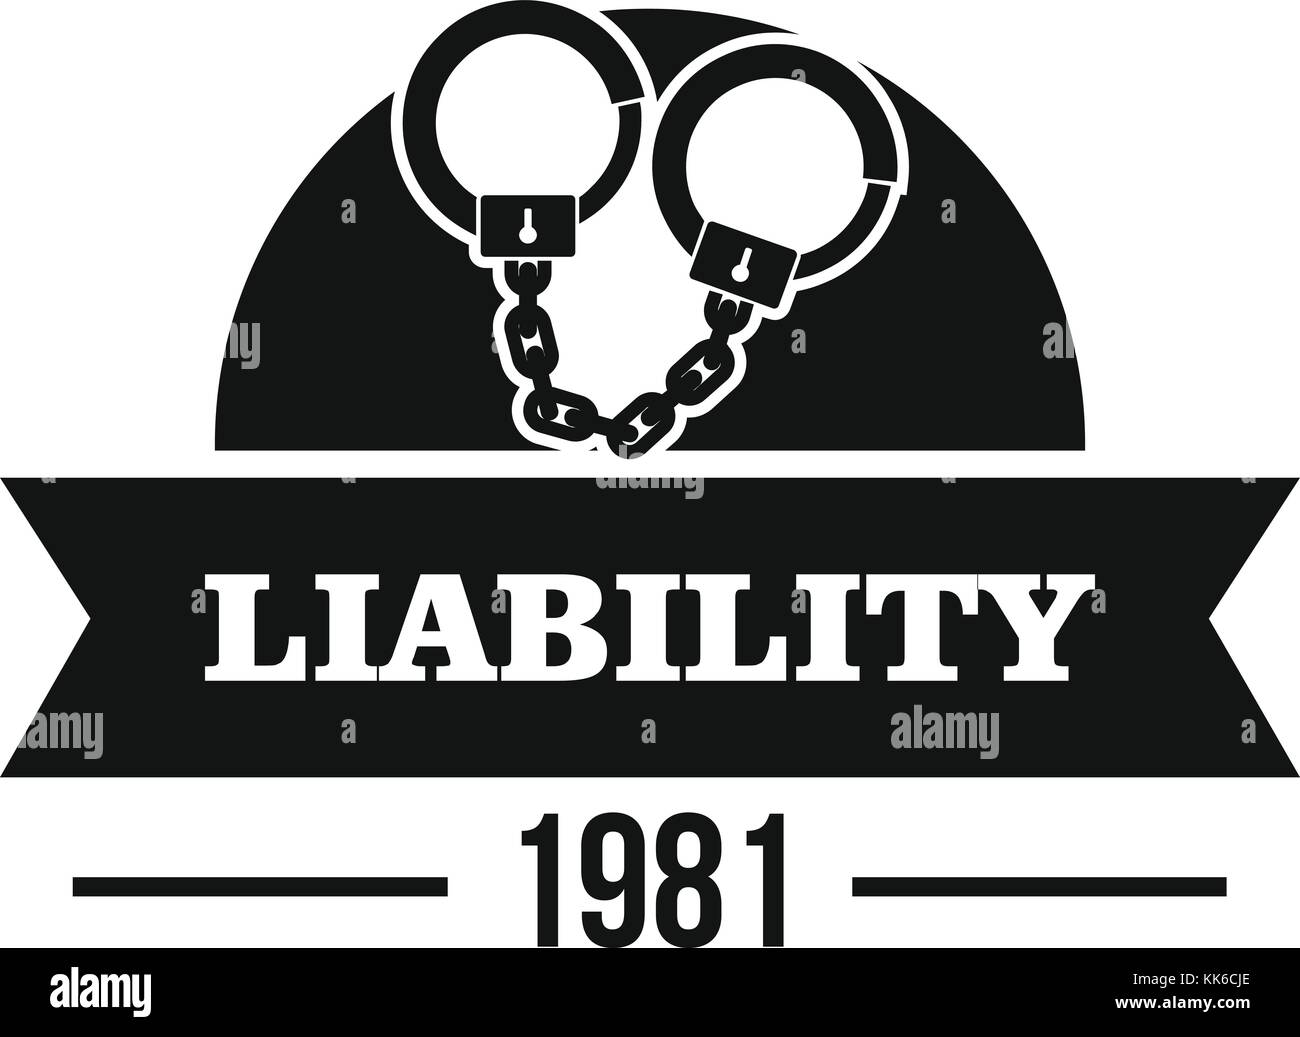 liability logo simple black style stock vector art illustration